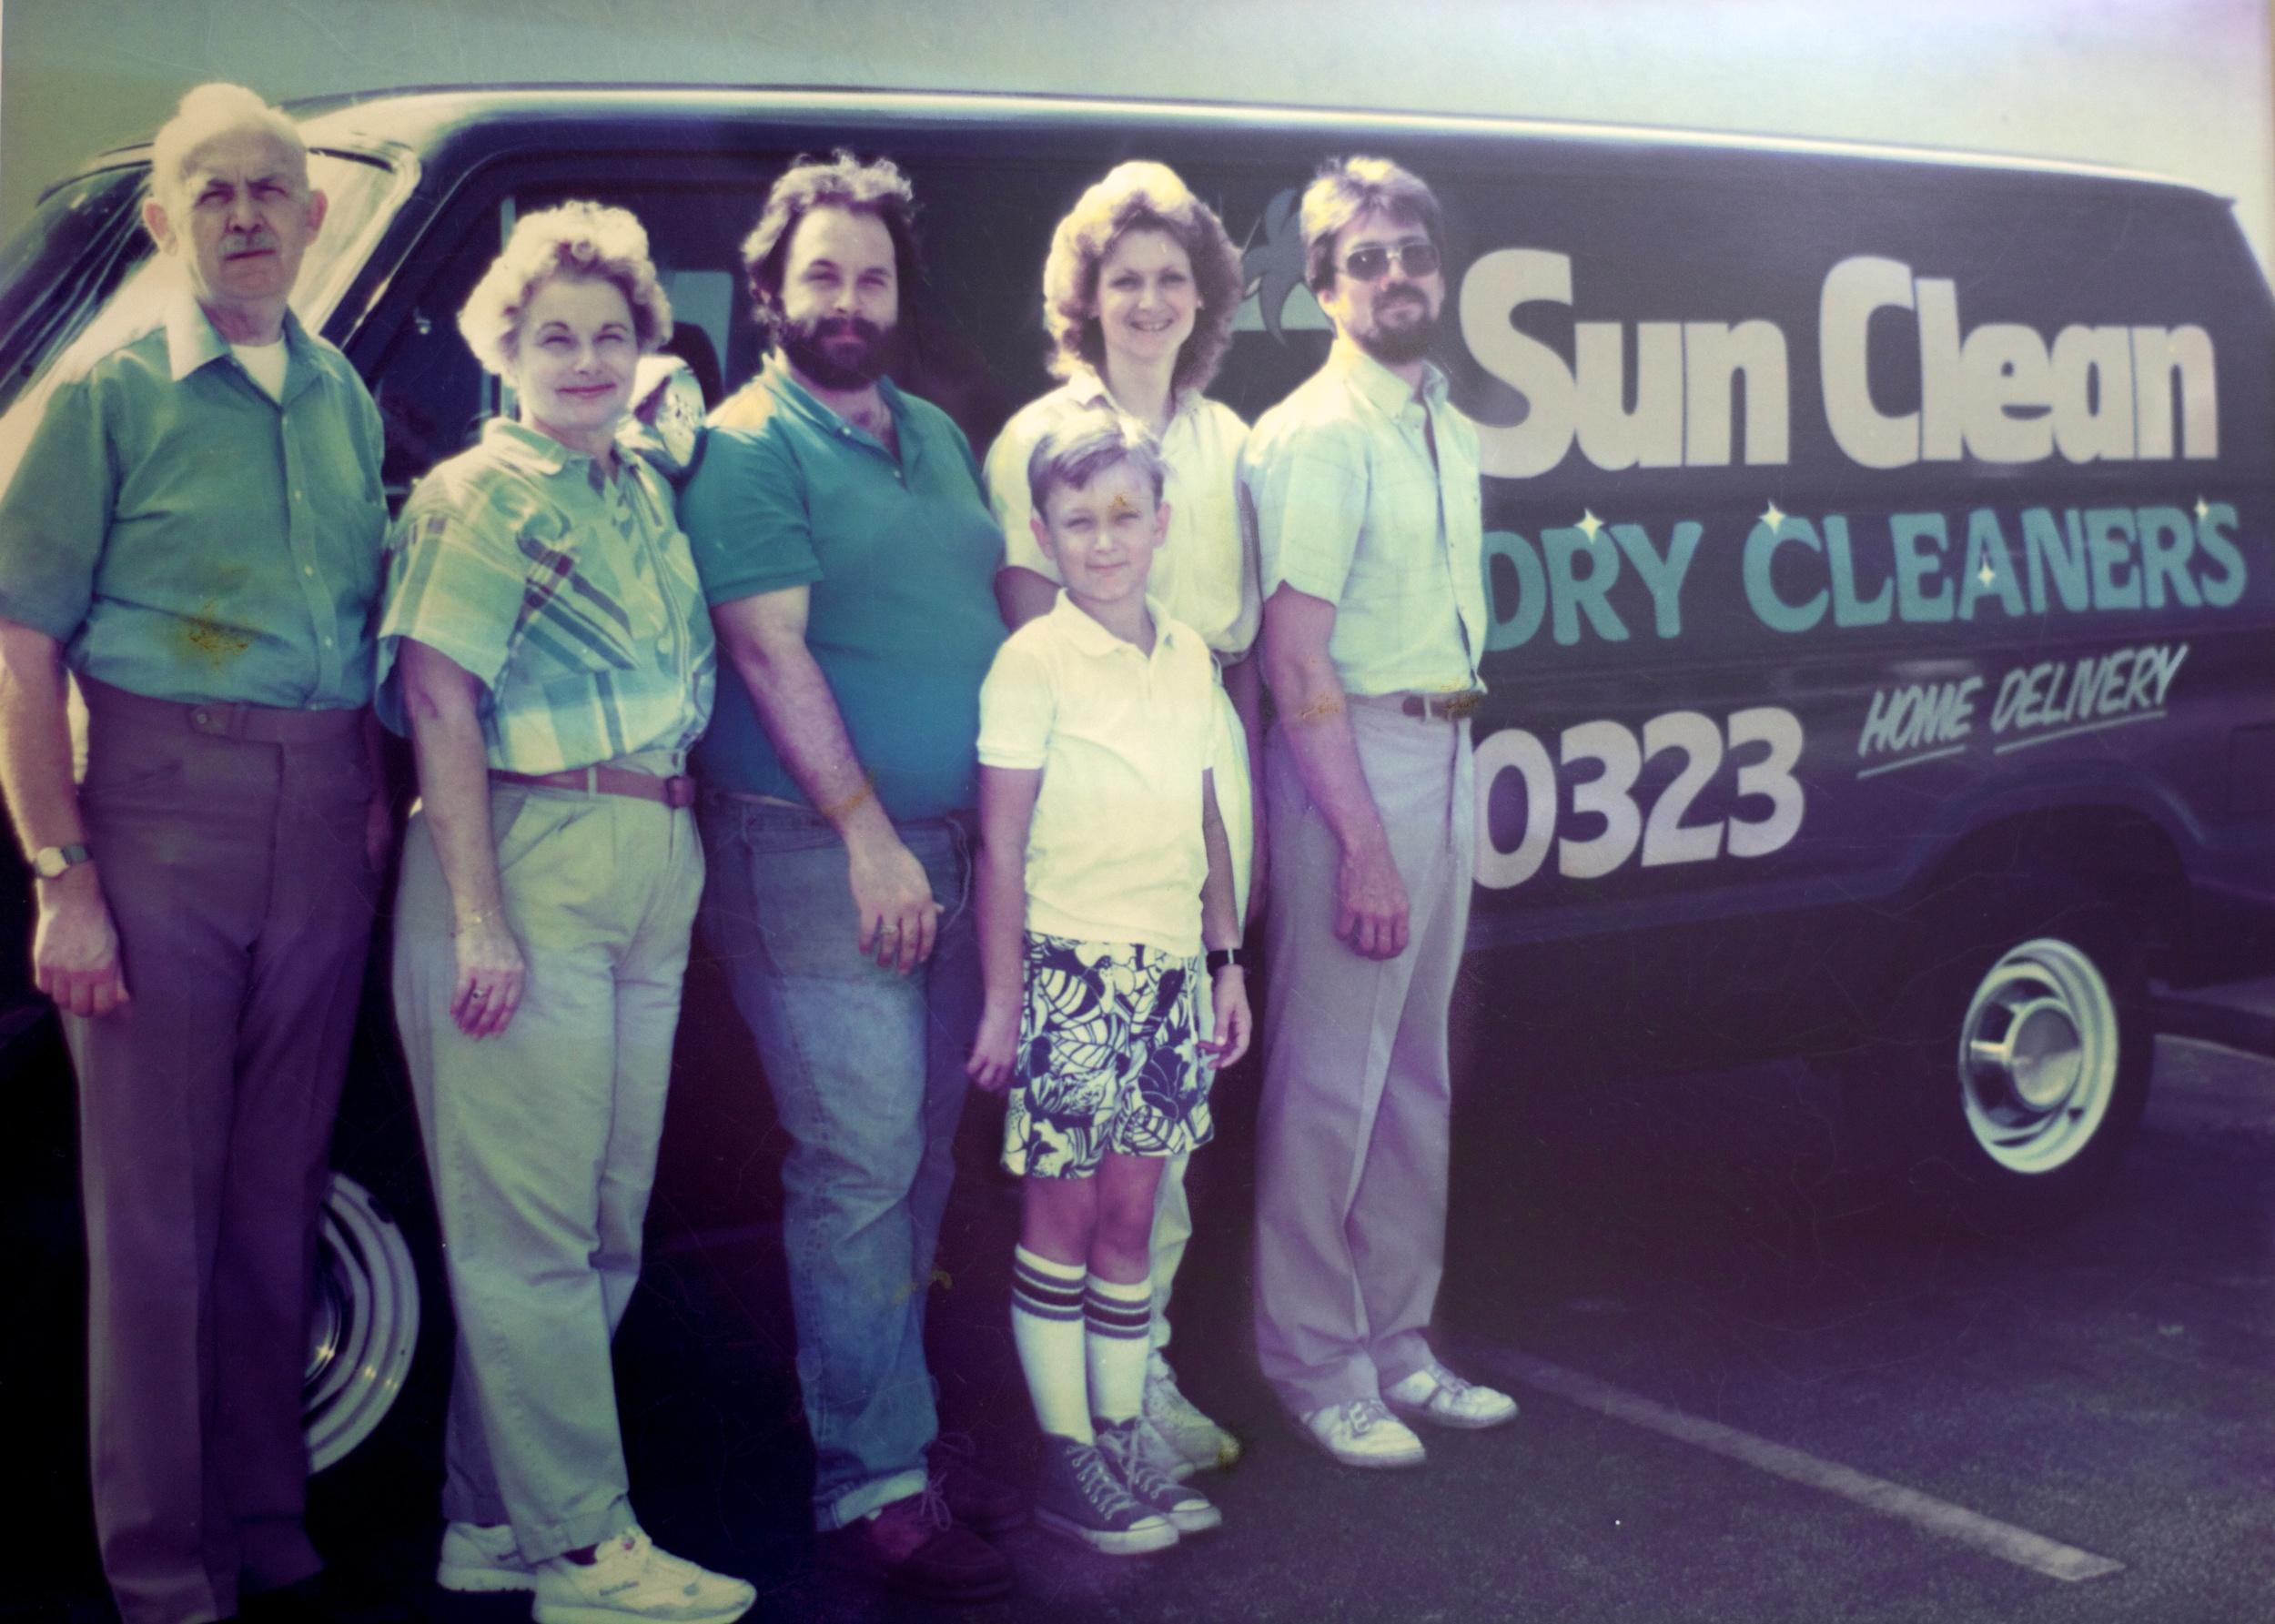 Frank, Dot, Mark, Josh, Barb and Joe in 1987